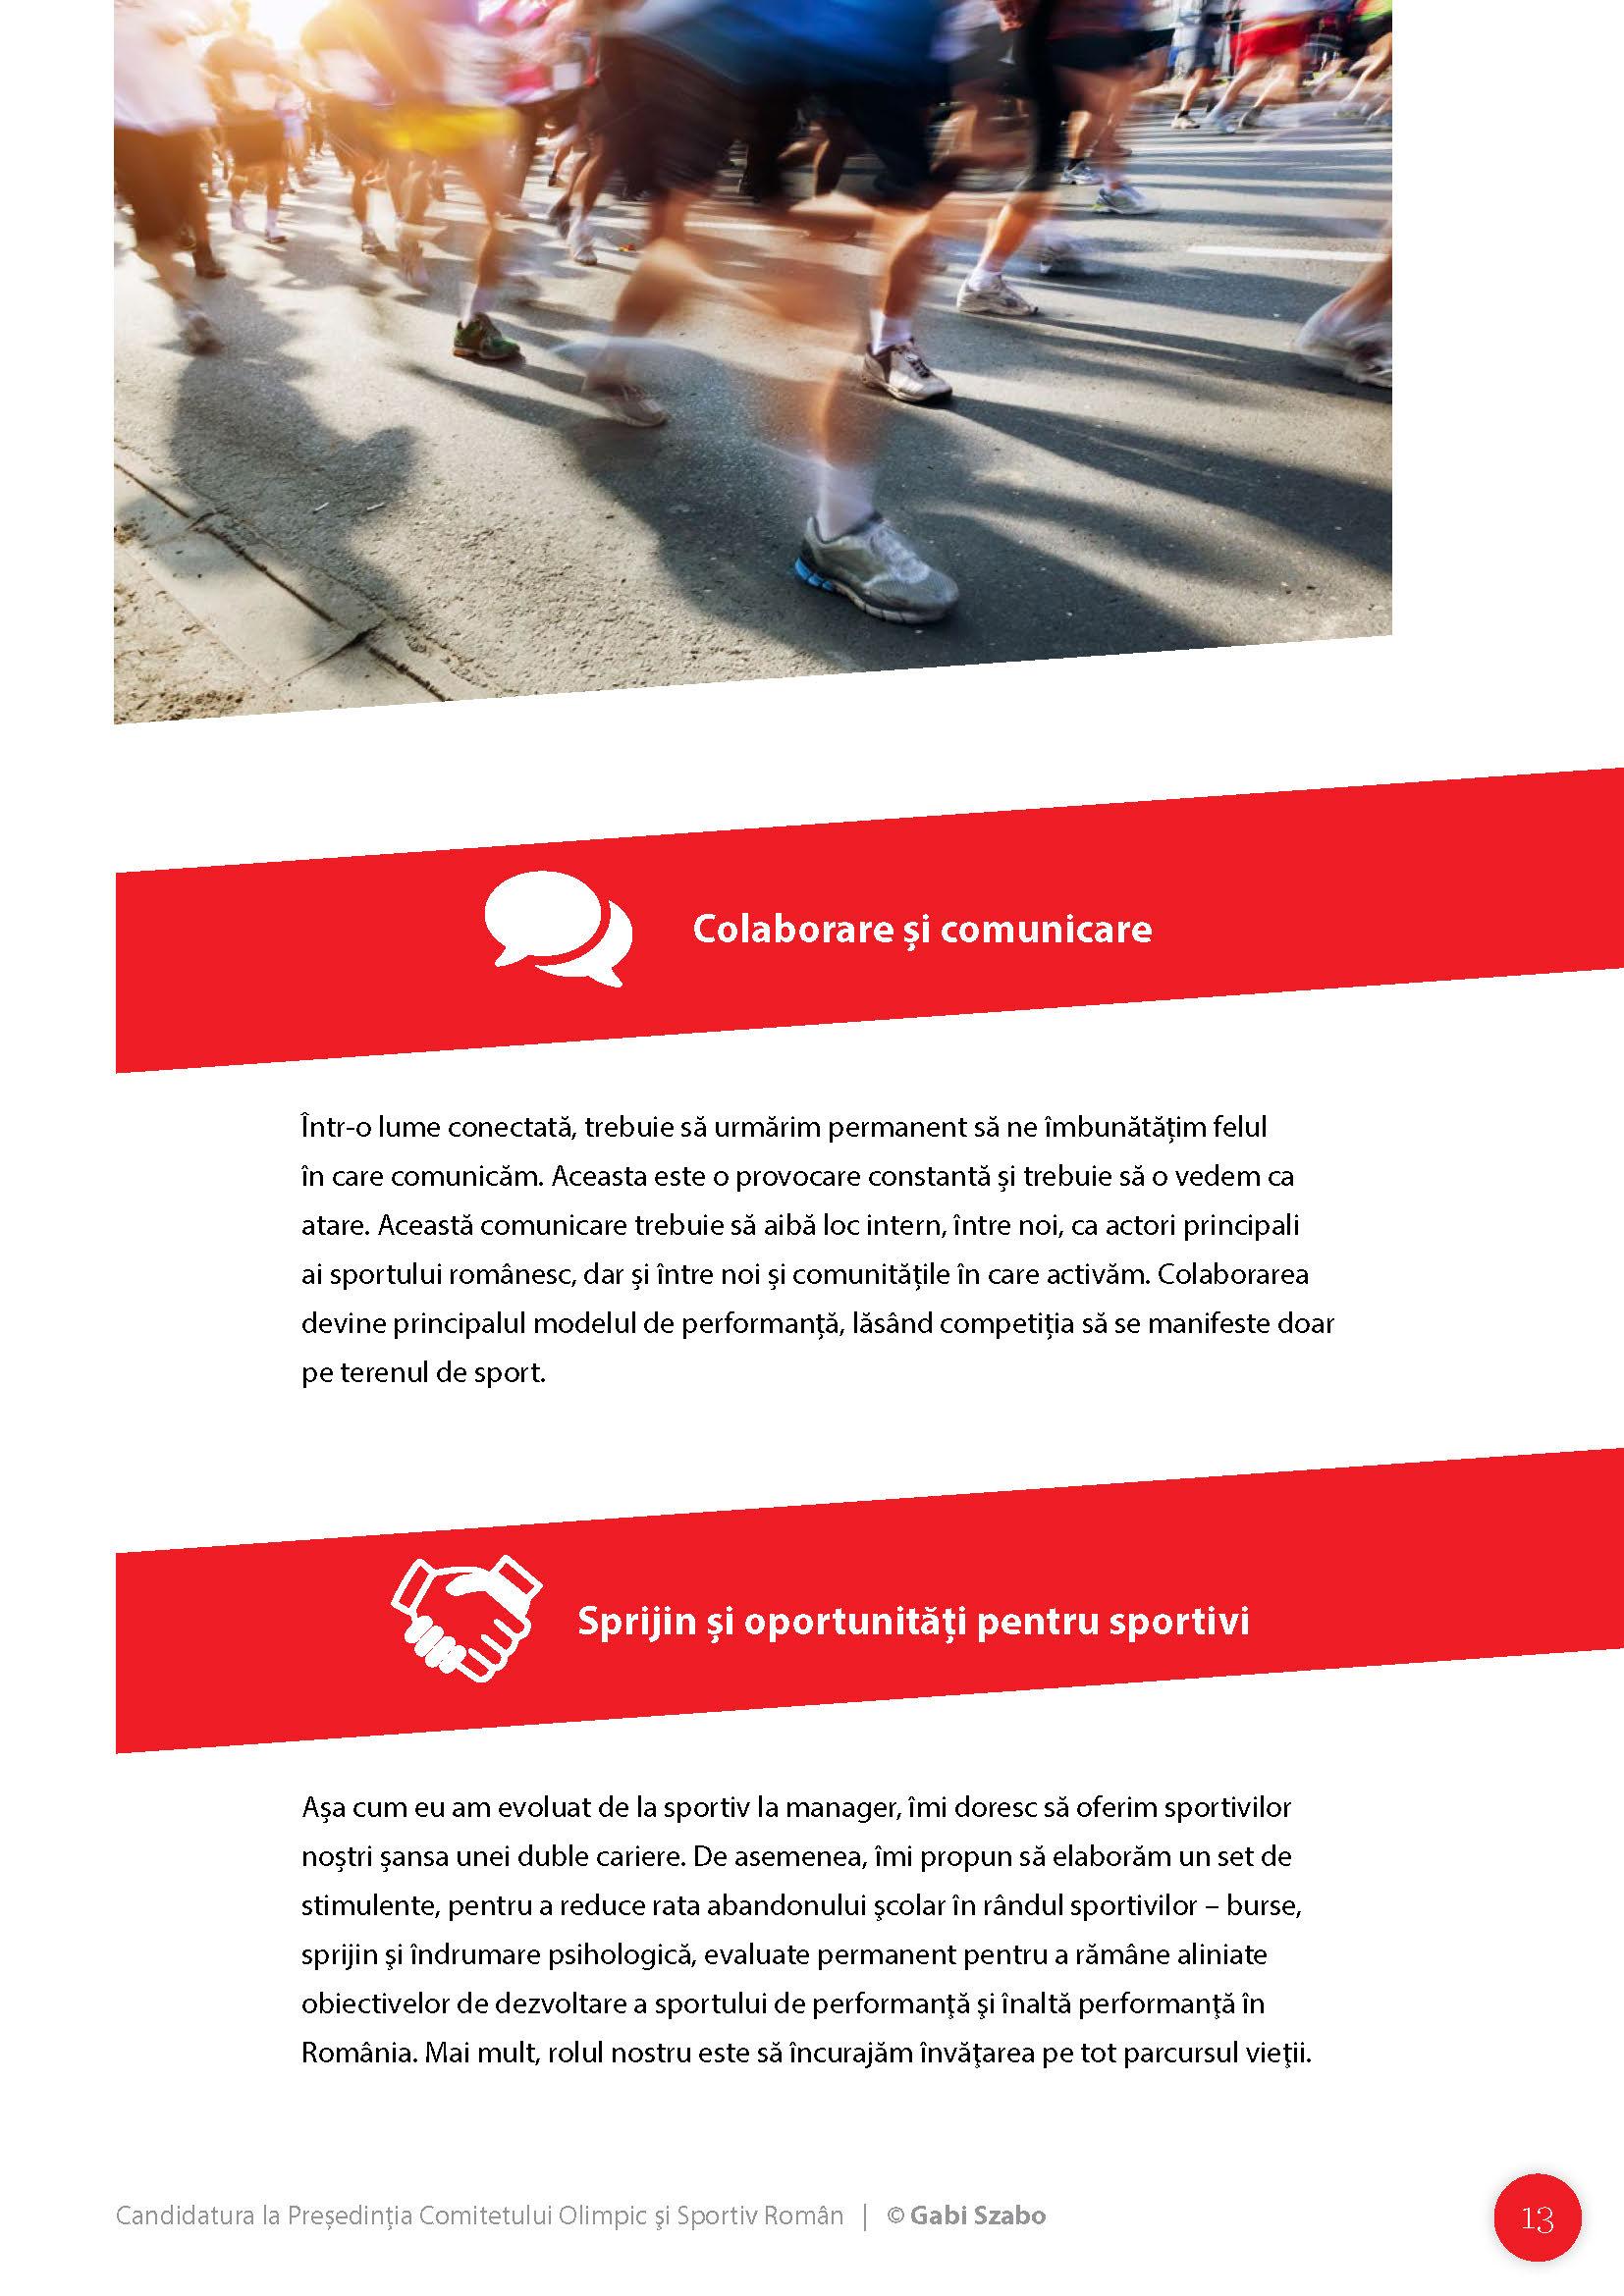 spv02_candidatura-cosr_1-6_pco_13oct16_page_13